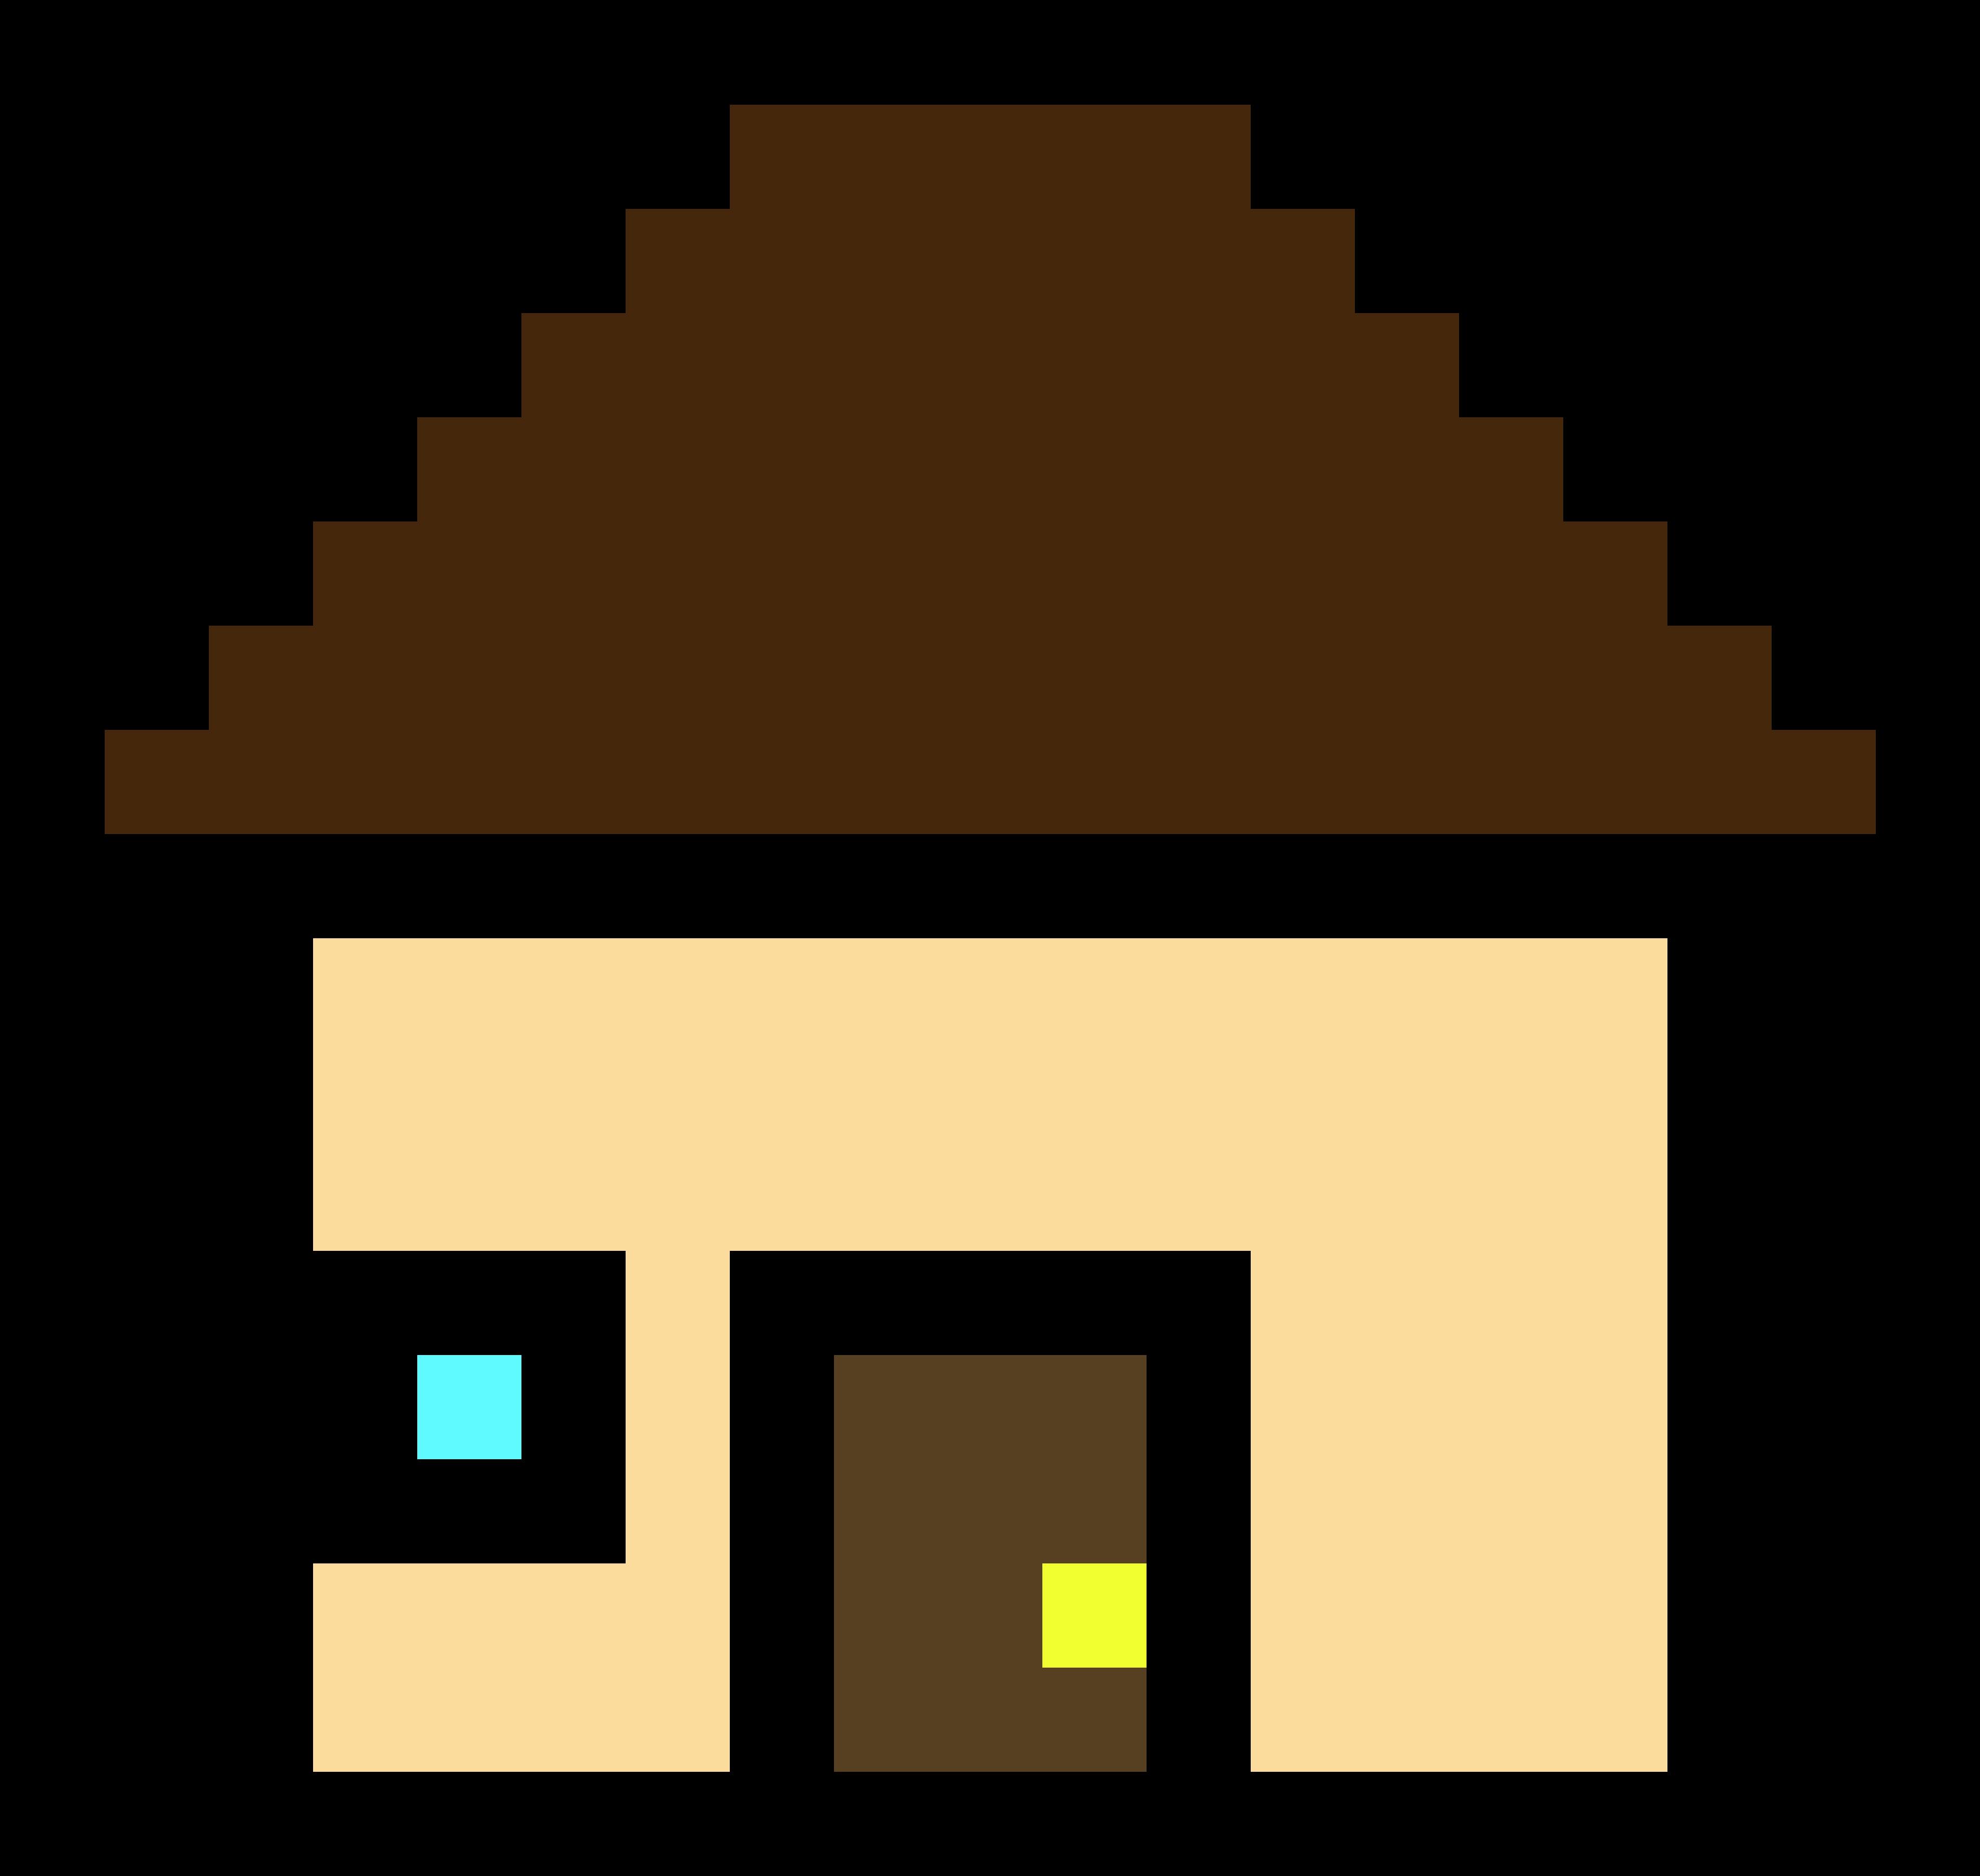 Pixel art transparent full. Alien clipart house